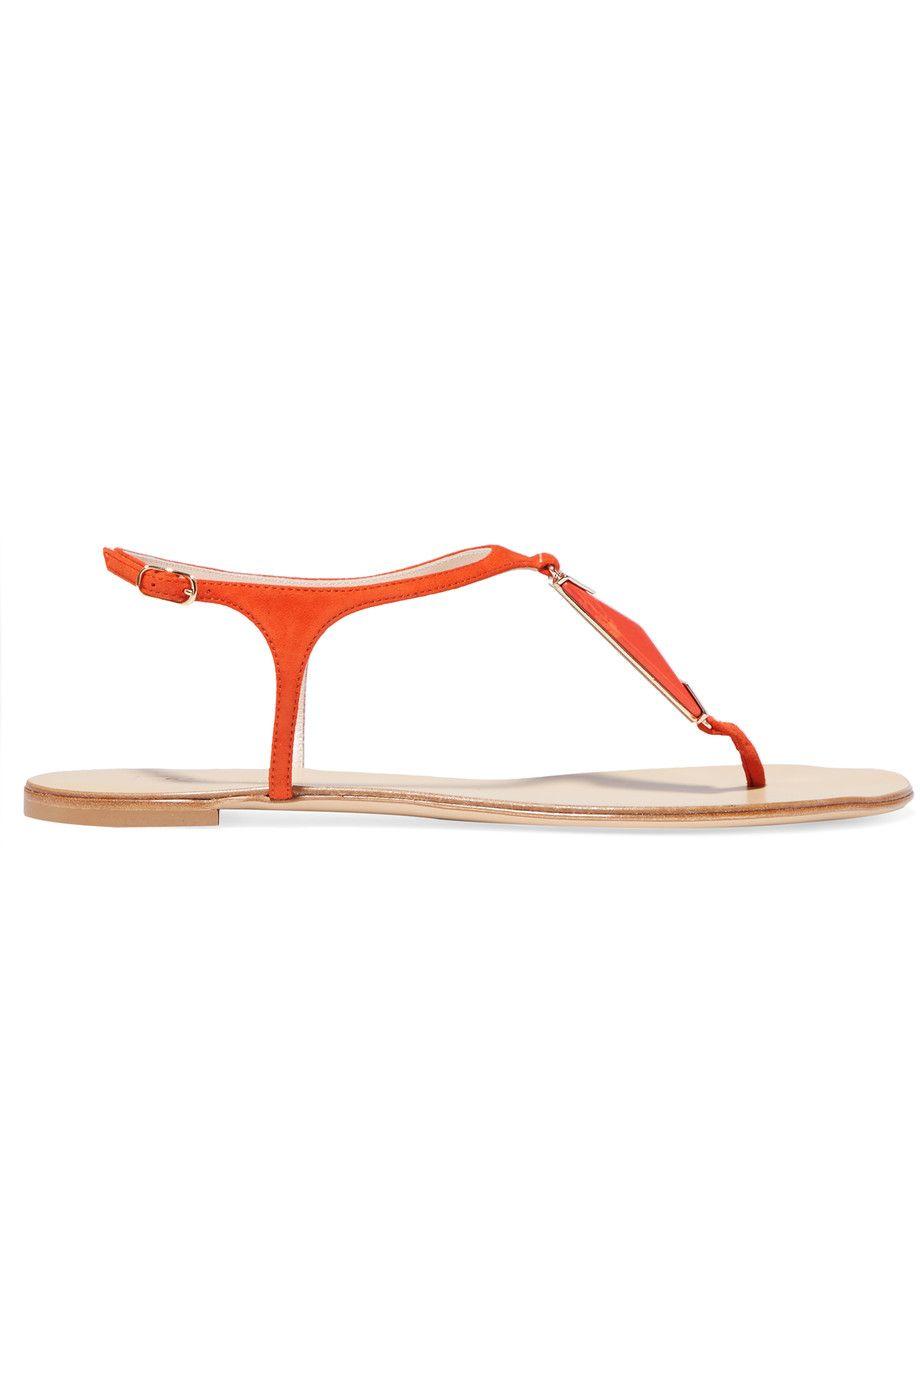 CASADEI Stone-Embellished Suede Sandals. #casadei #shoes #sandals